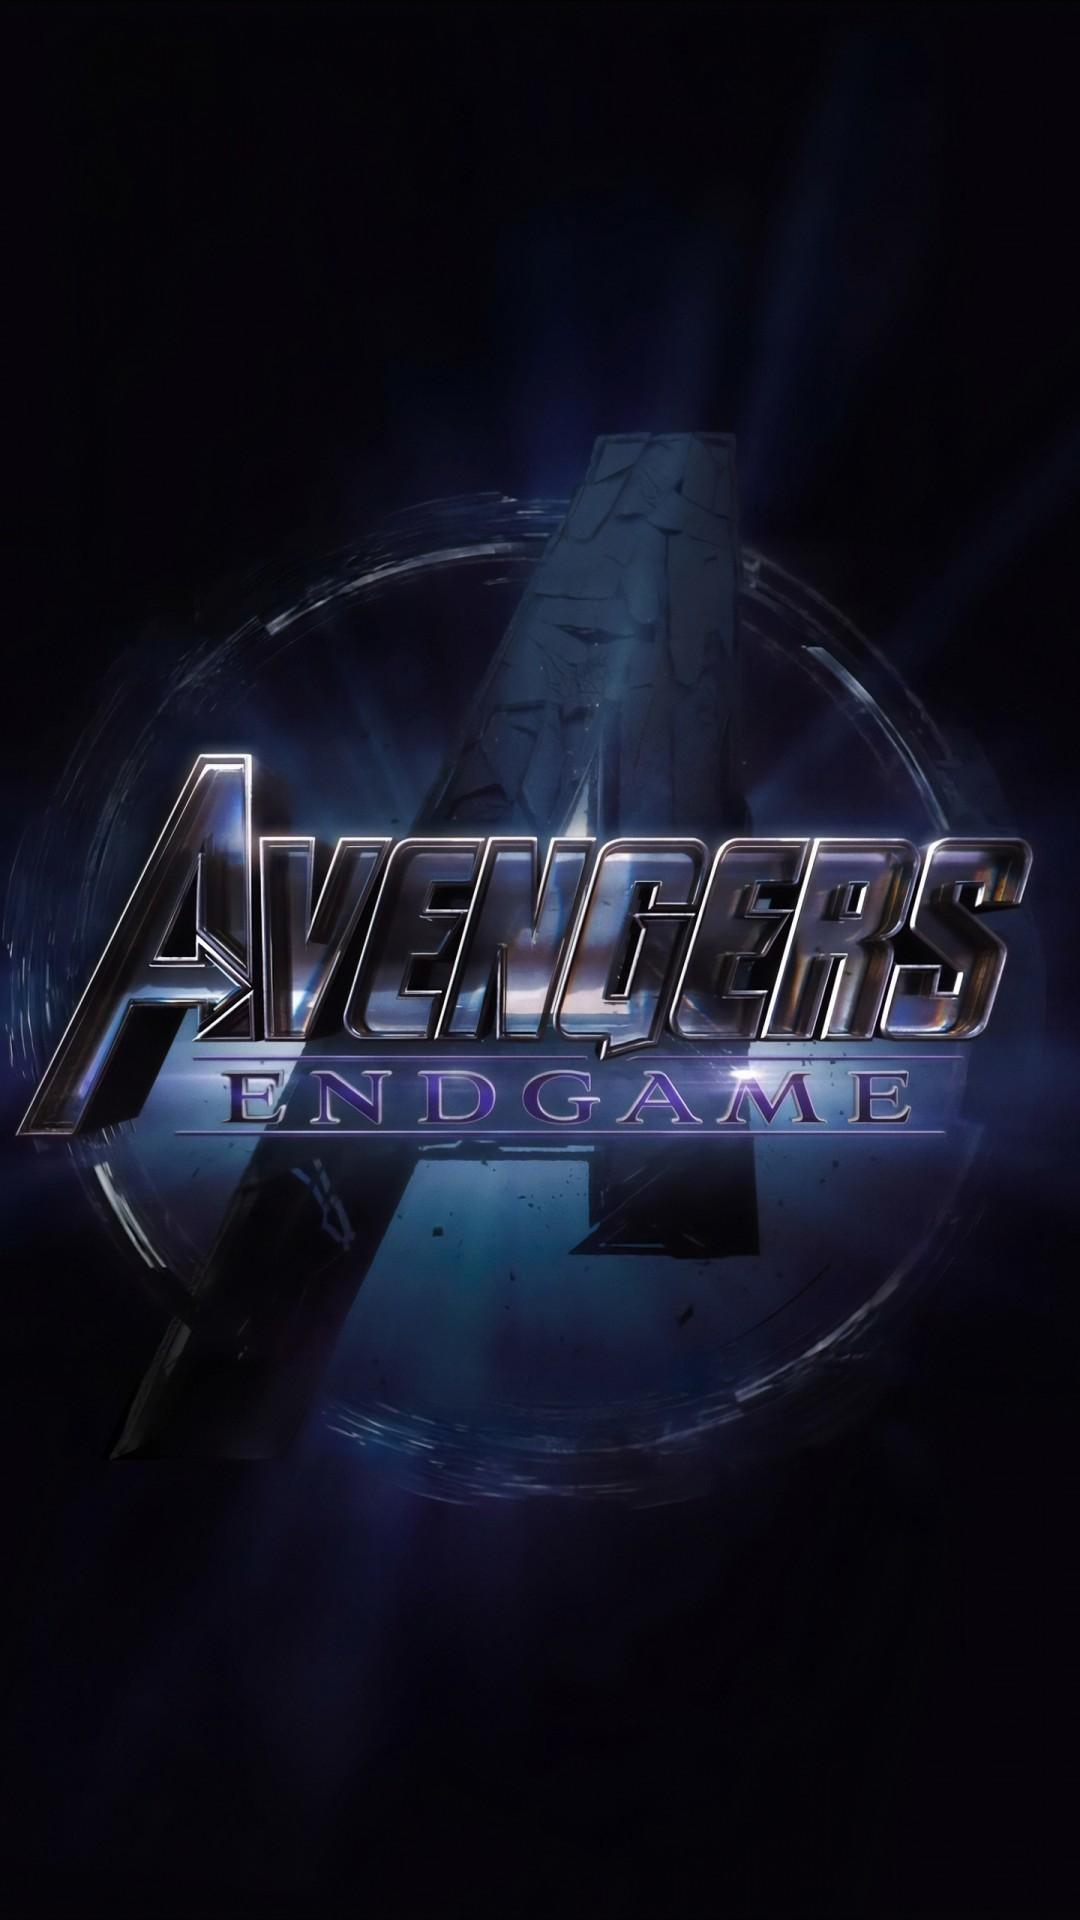 Free Avengers 4 Endgame phone wallpaper by musiclove6